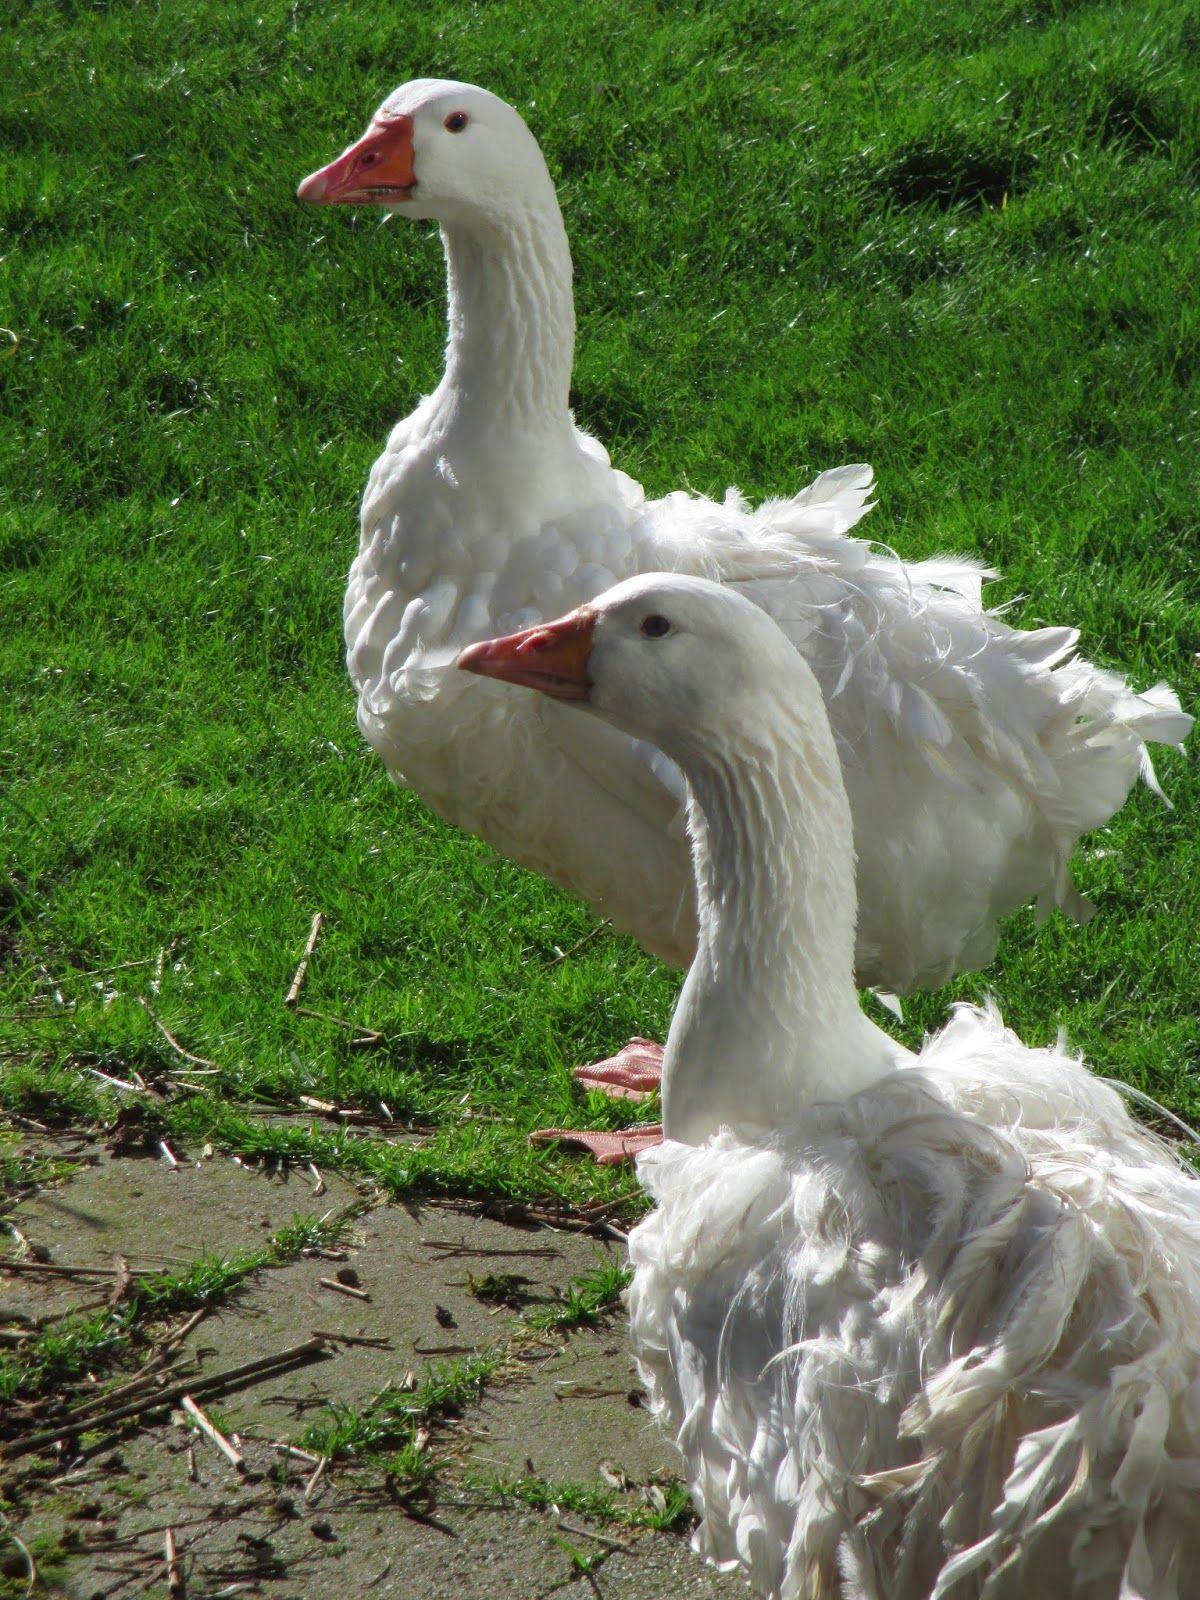 Popular Domesticated Goose Breeds Sebastopol Goose Breed Amazing Animals